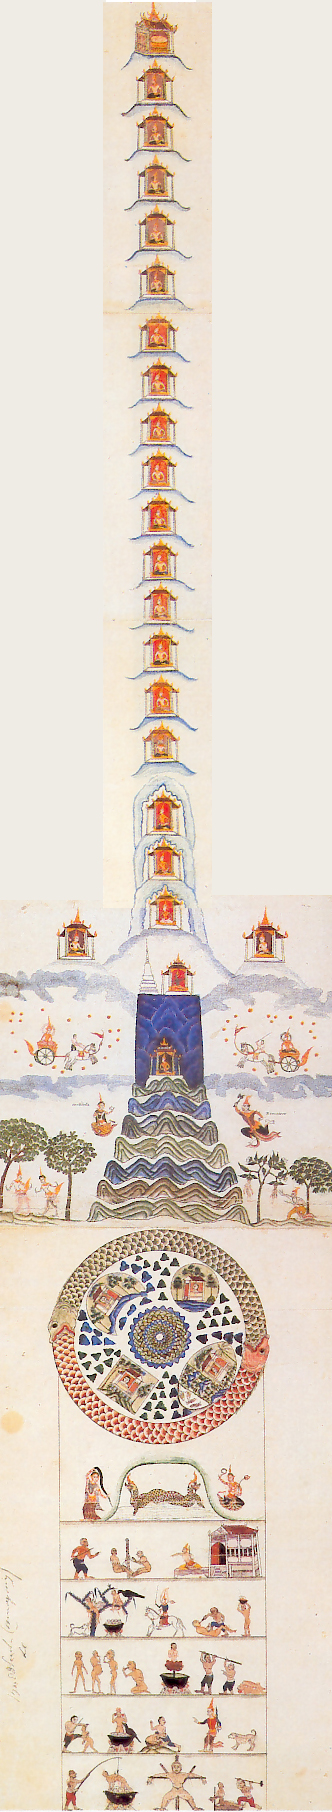 Le monde indo-bouddhique